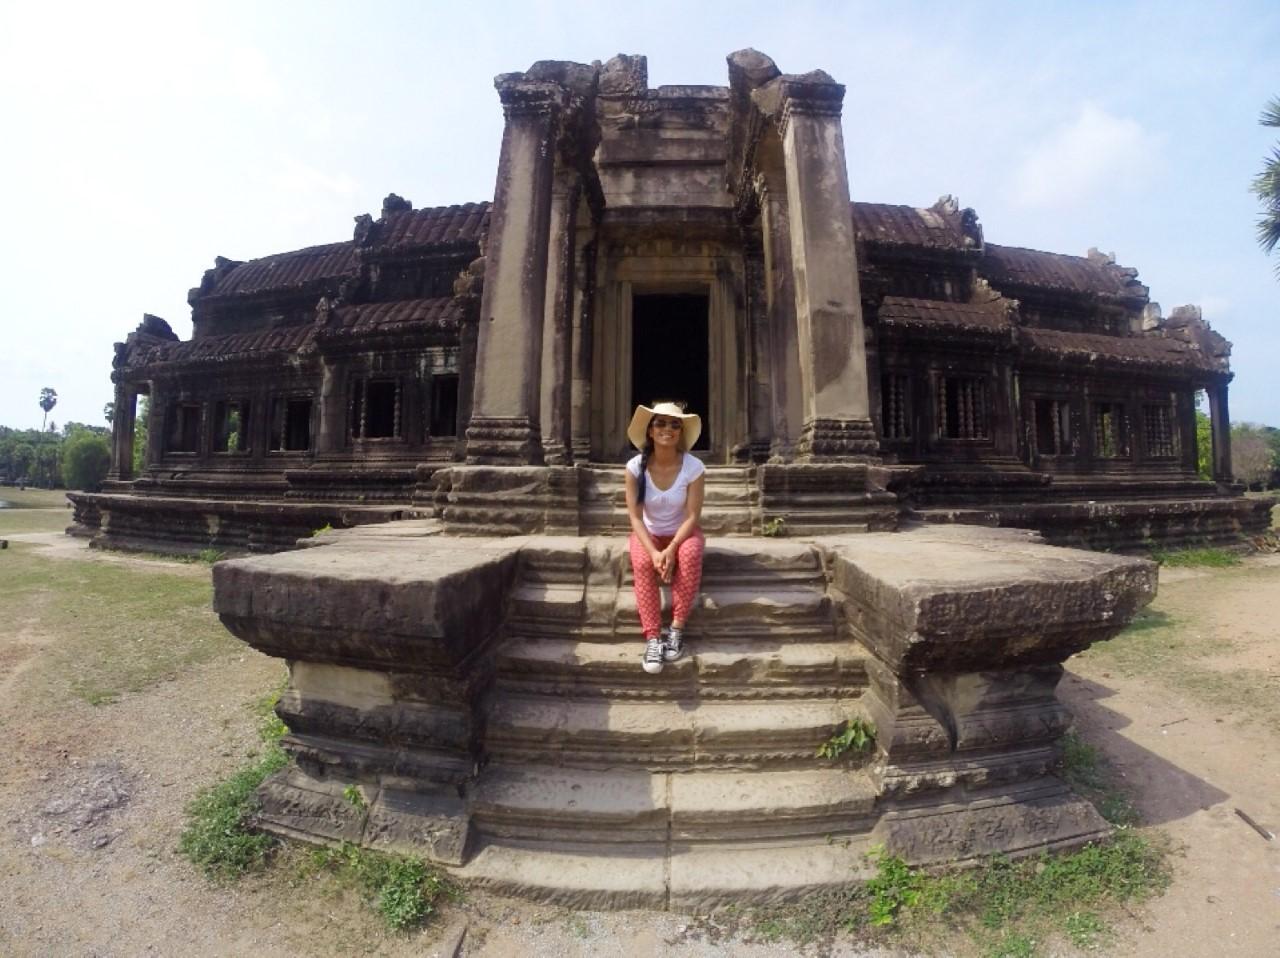 Lesley, Cambodia - April 18